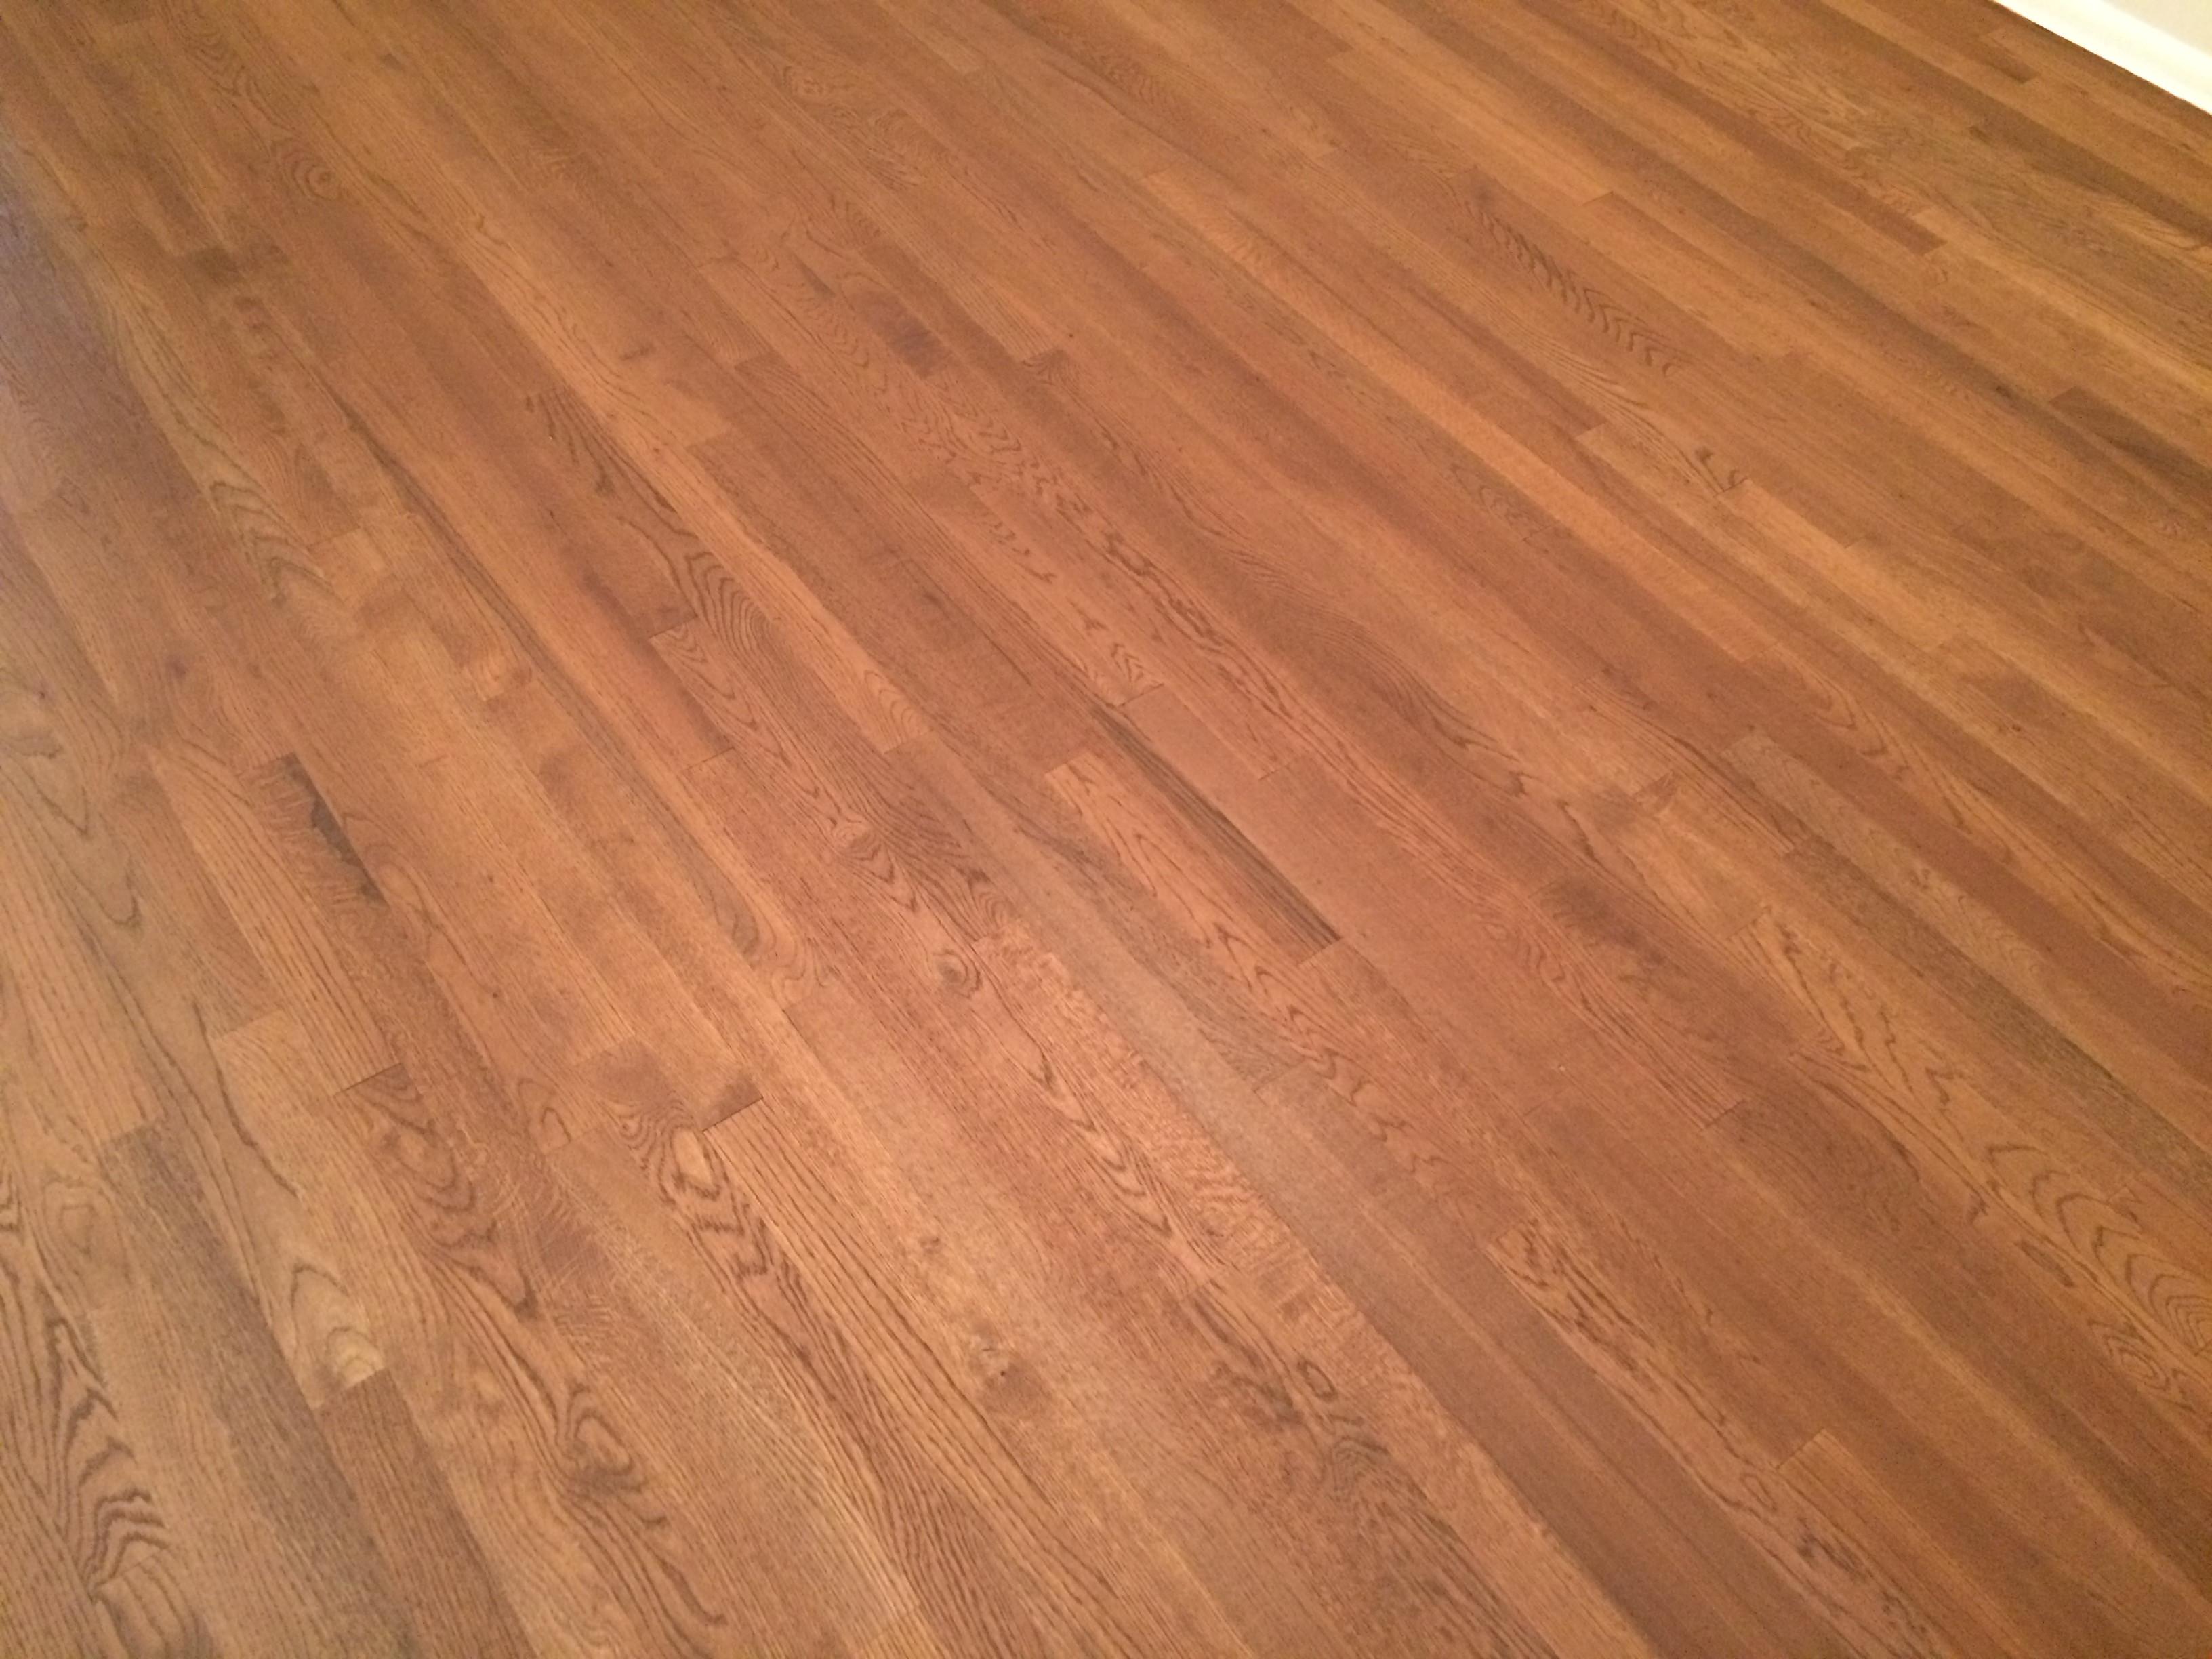 hardwood floor repair long beach of flooring portfolio gorsegner brothers intended for img 0435